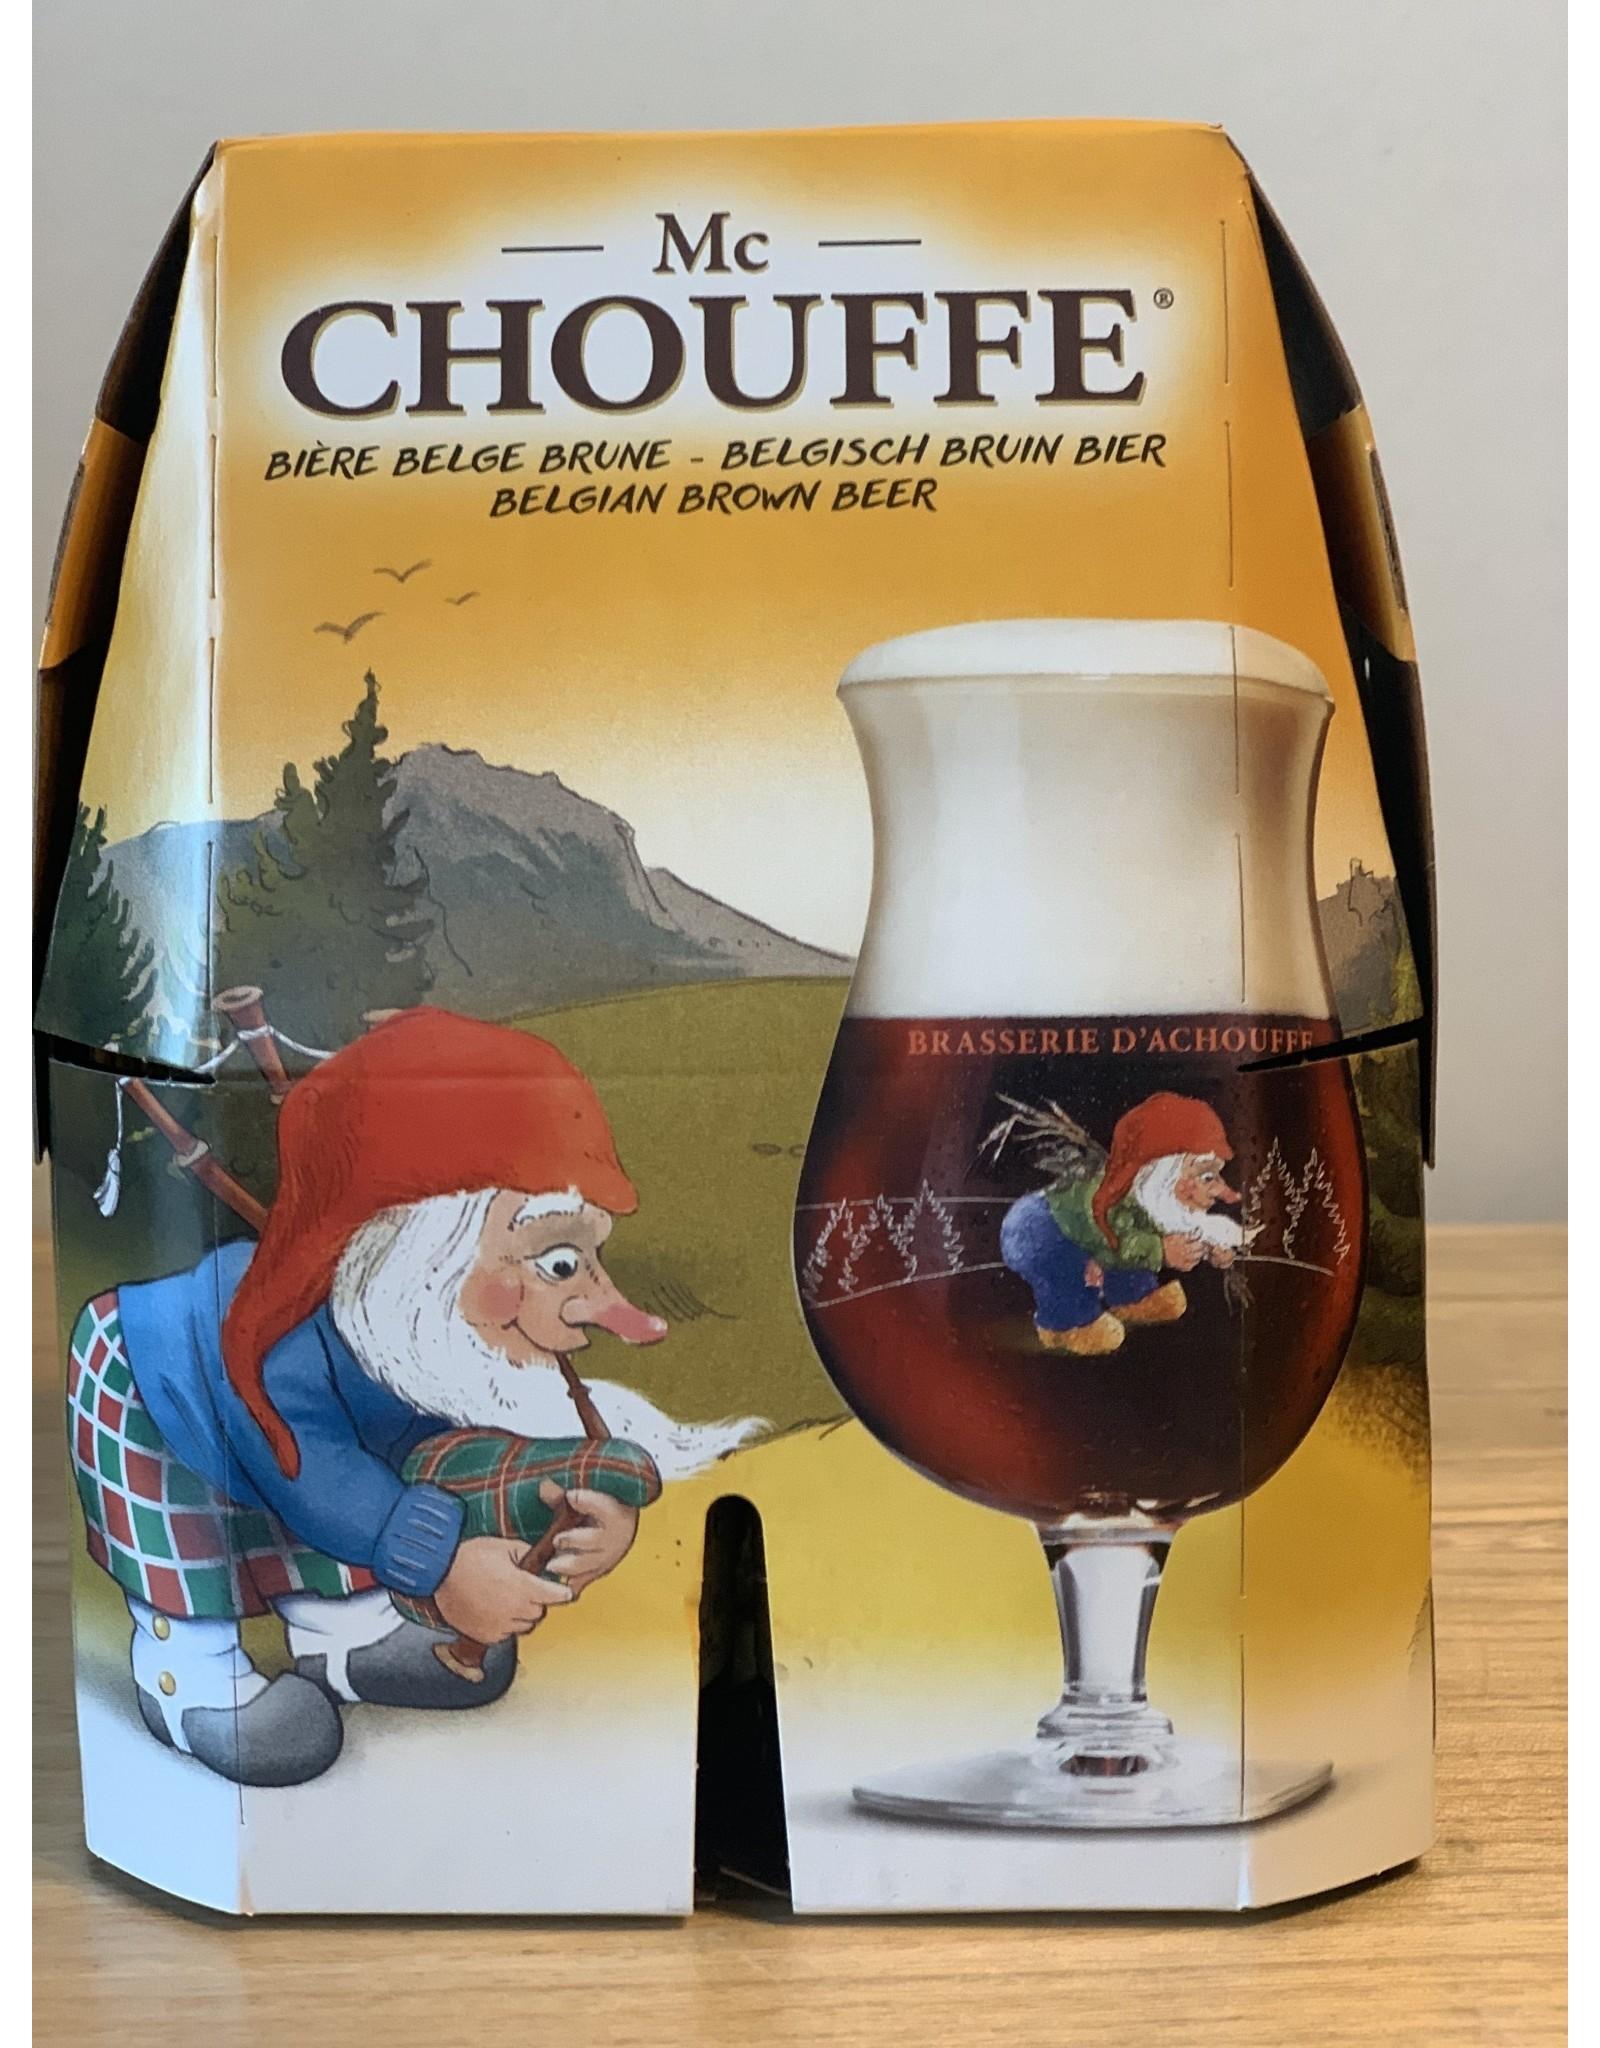 Brasserie d'Achouffe McChouffe Belgian Brown